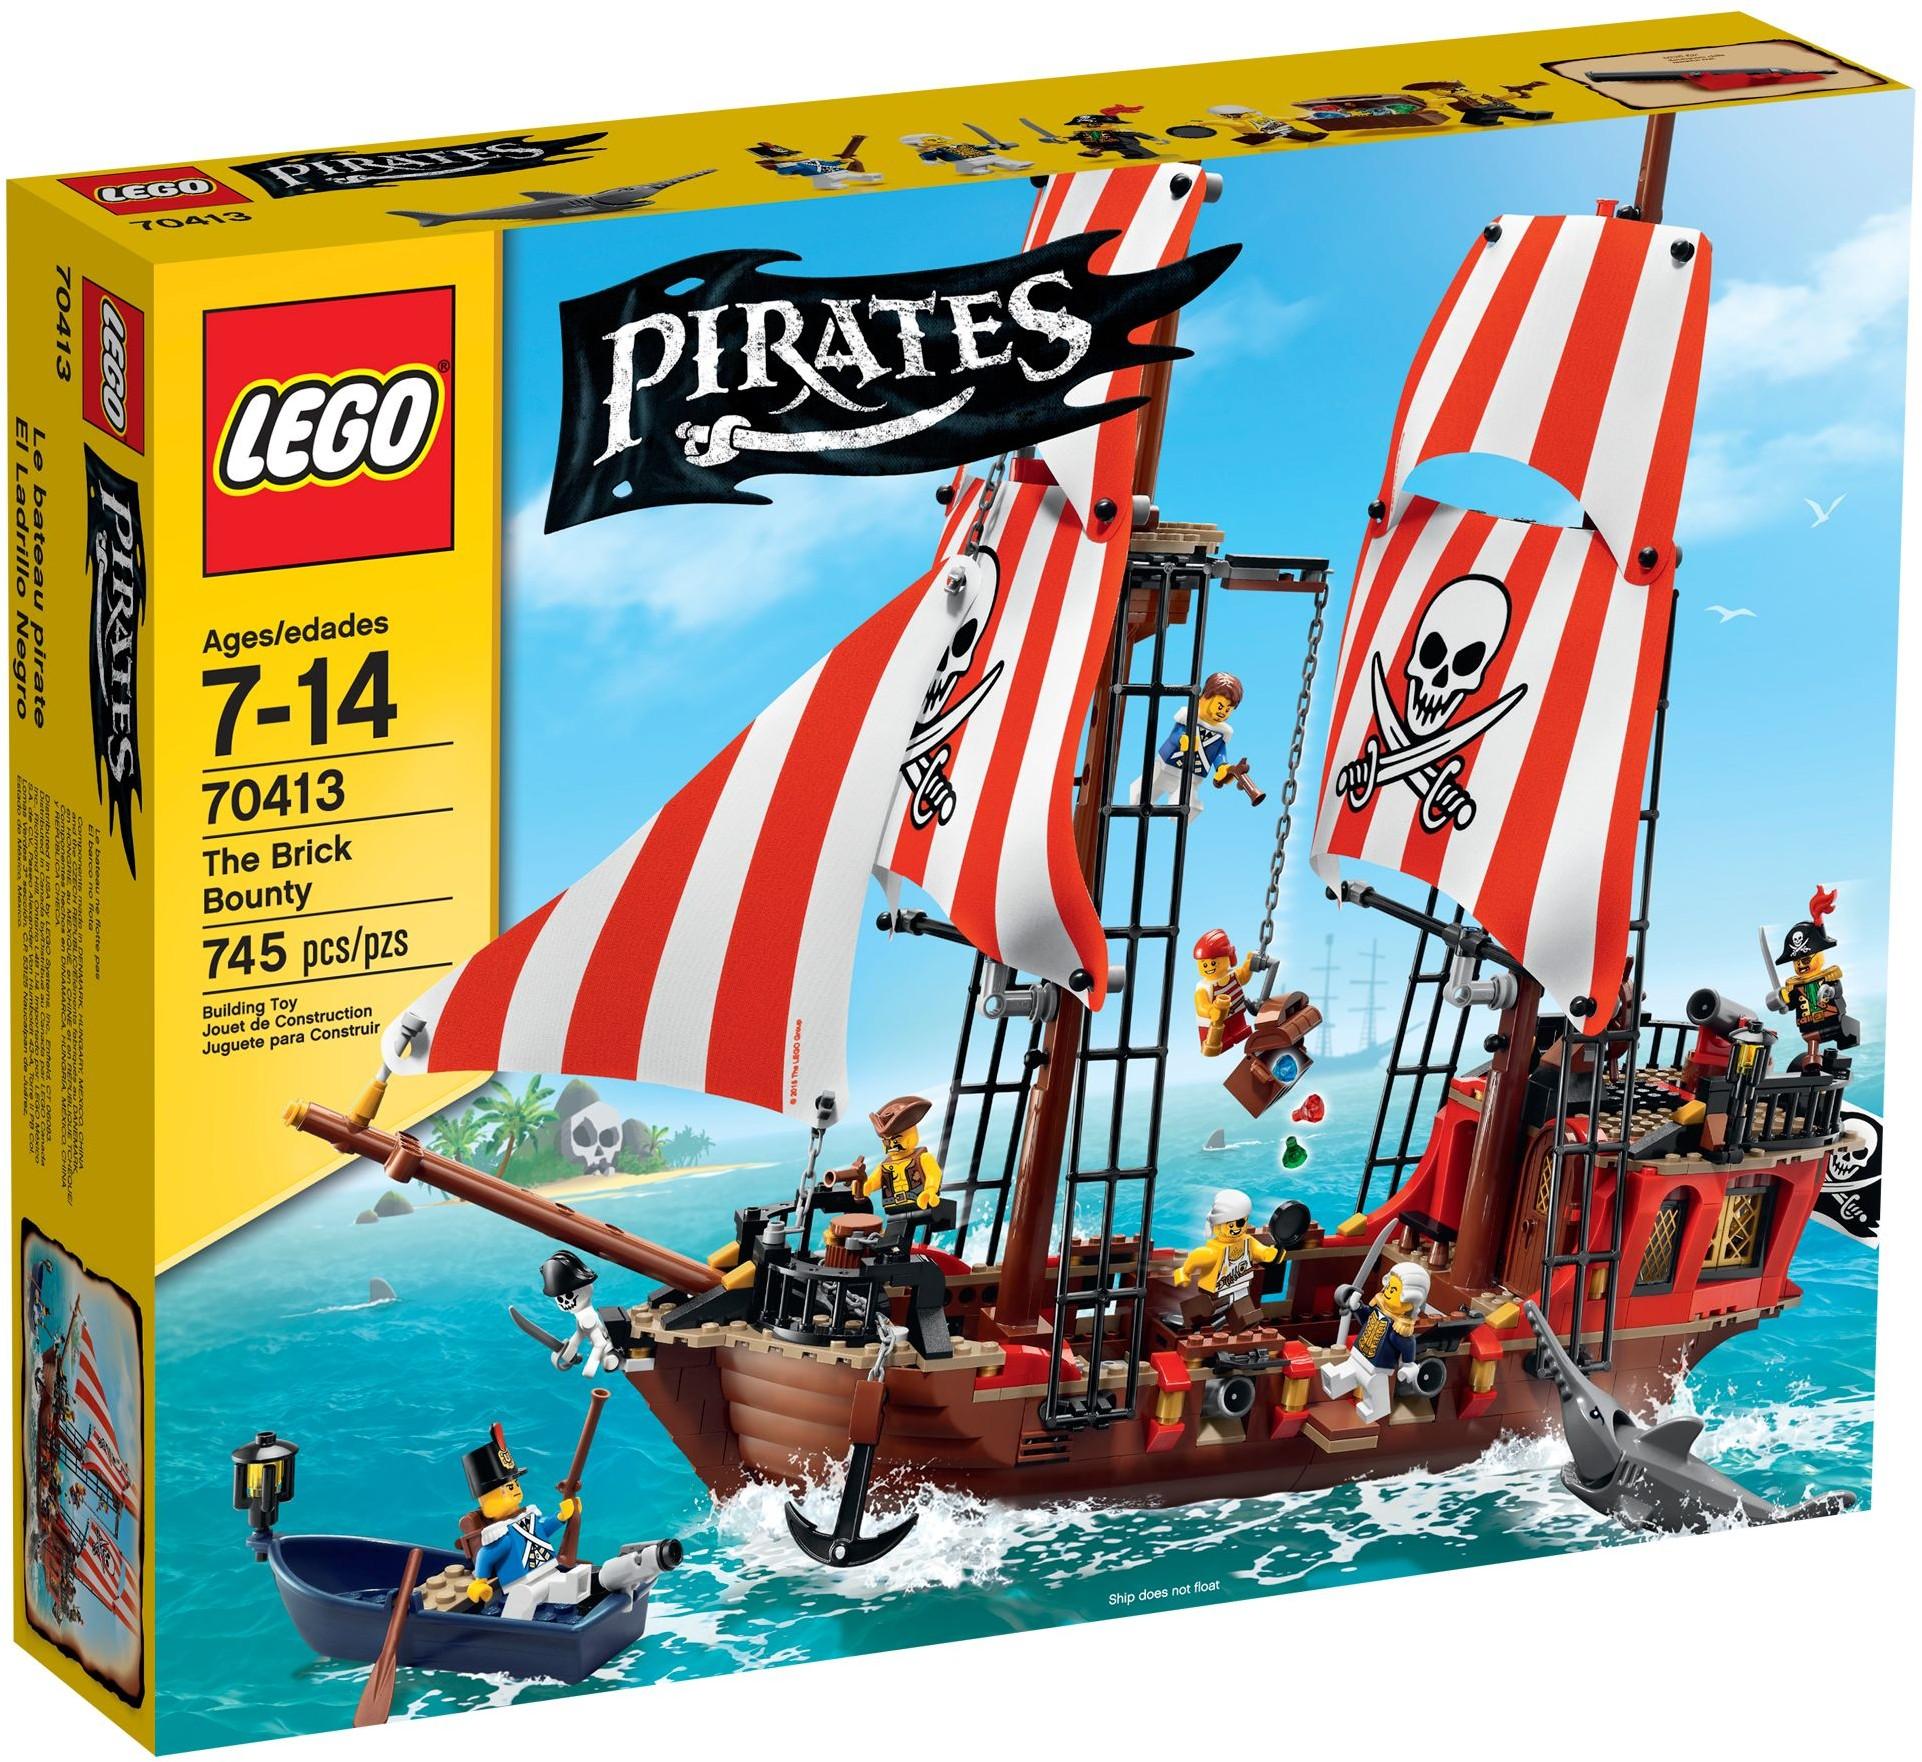 lego-pirates-the-brick-bounty-70413-2015 zusammengebaut.com